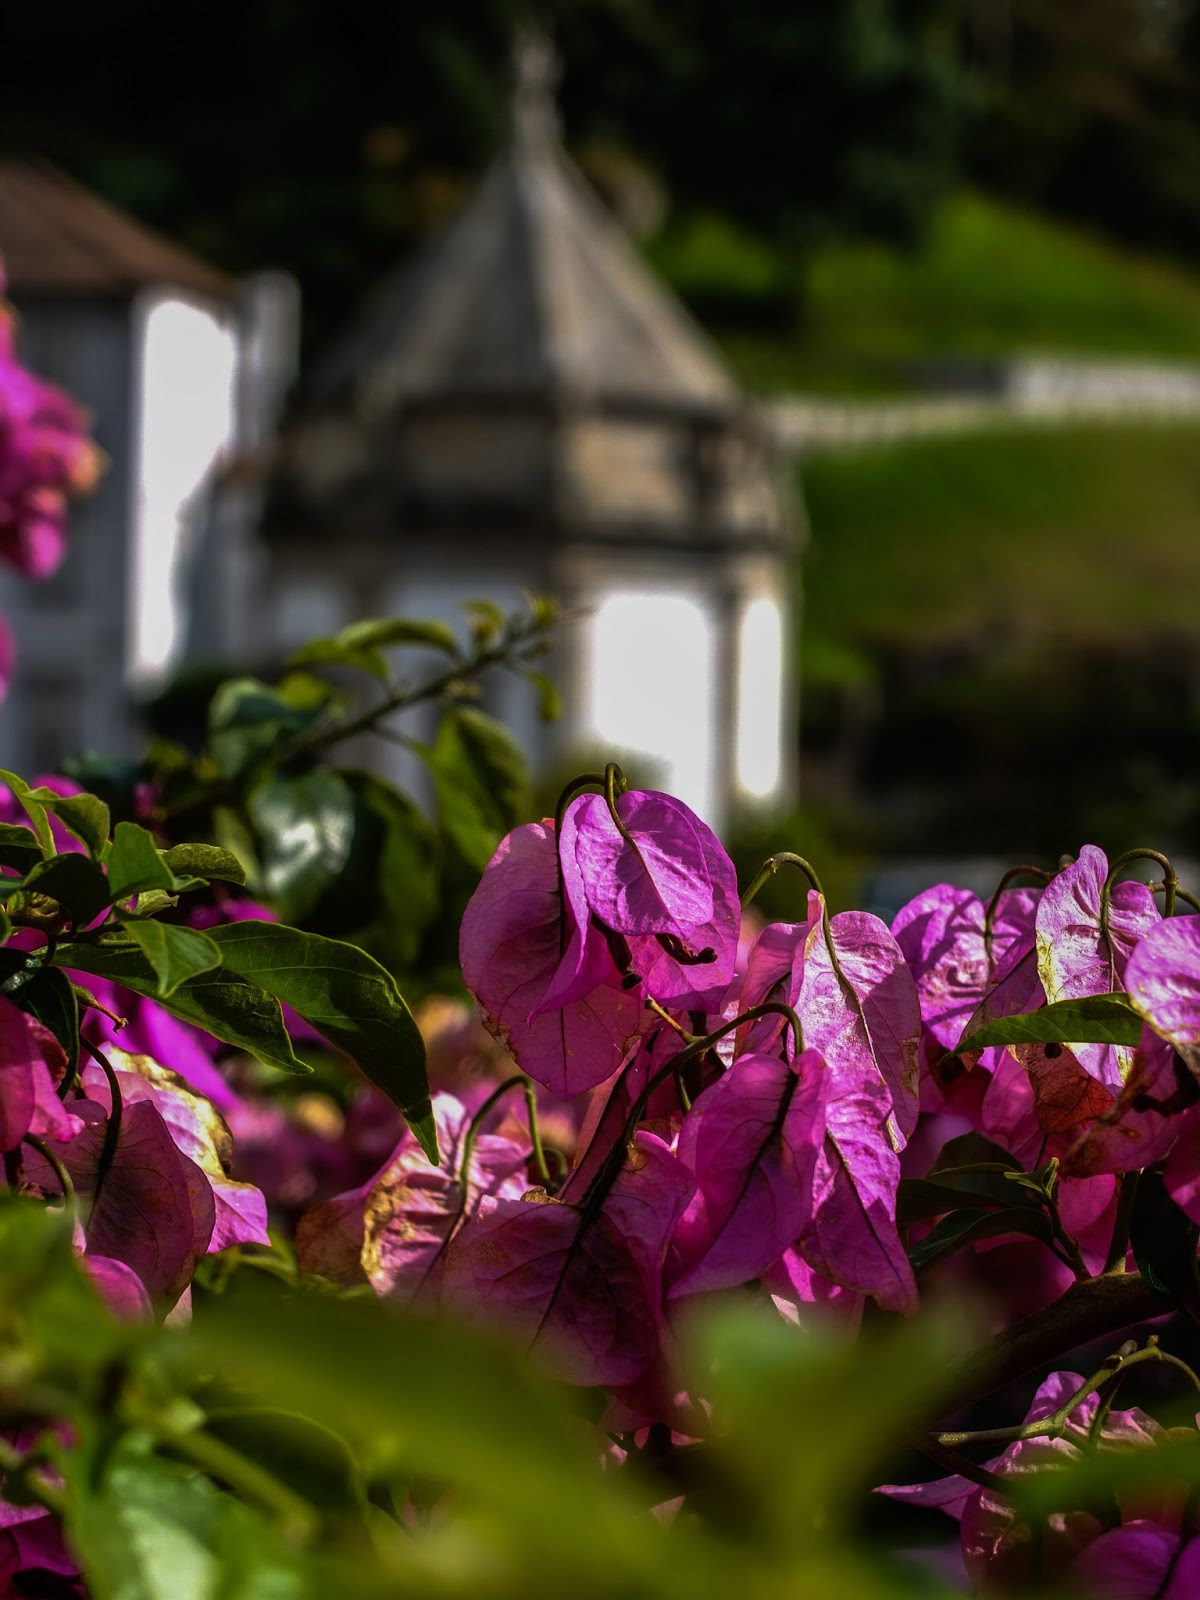 Pink flowers in the Bom Jesus do Monte Sanctuary in Braga, Portugal.